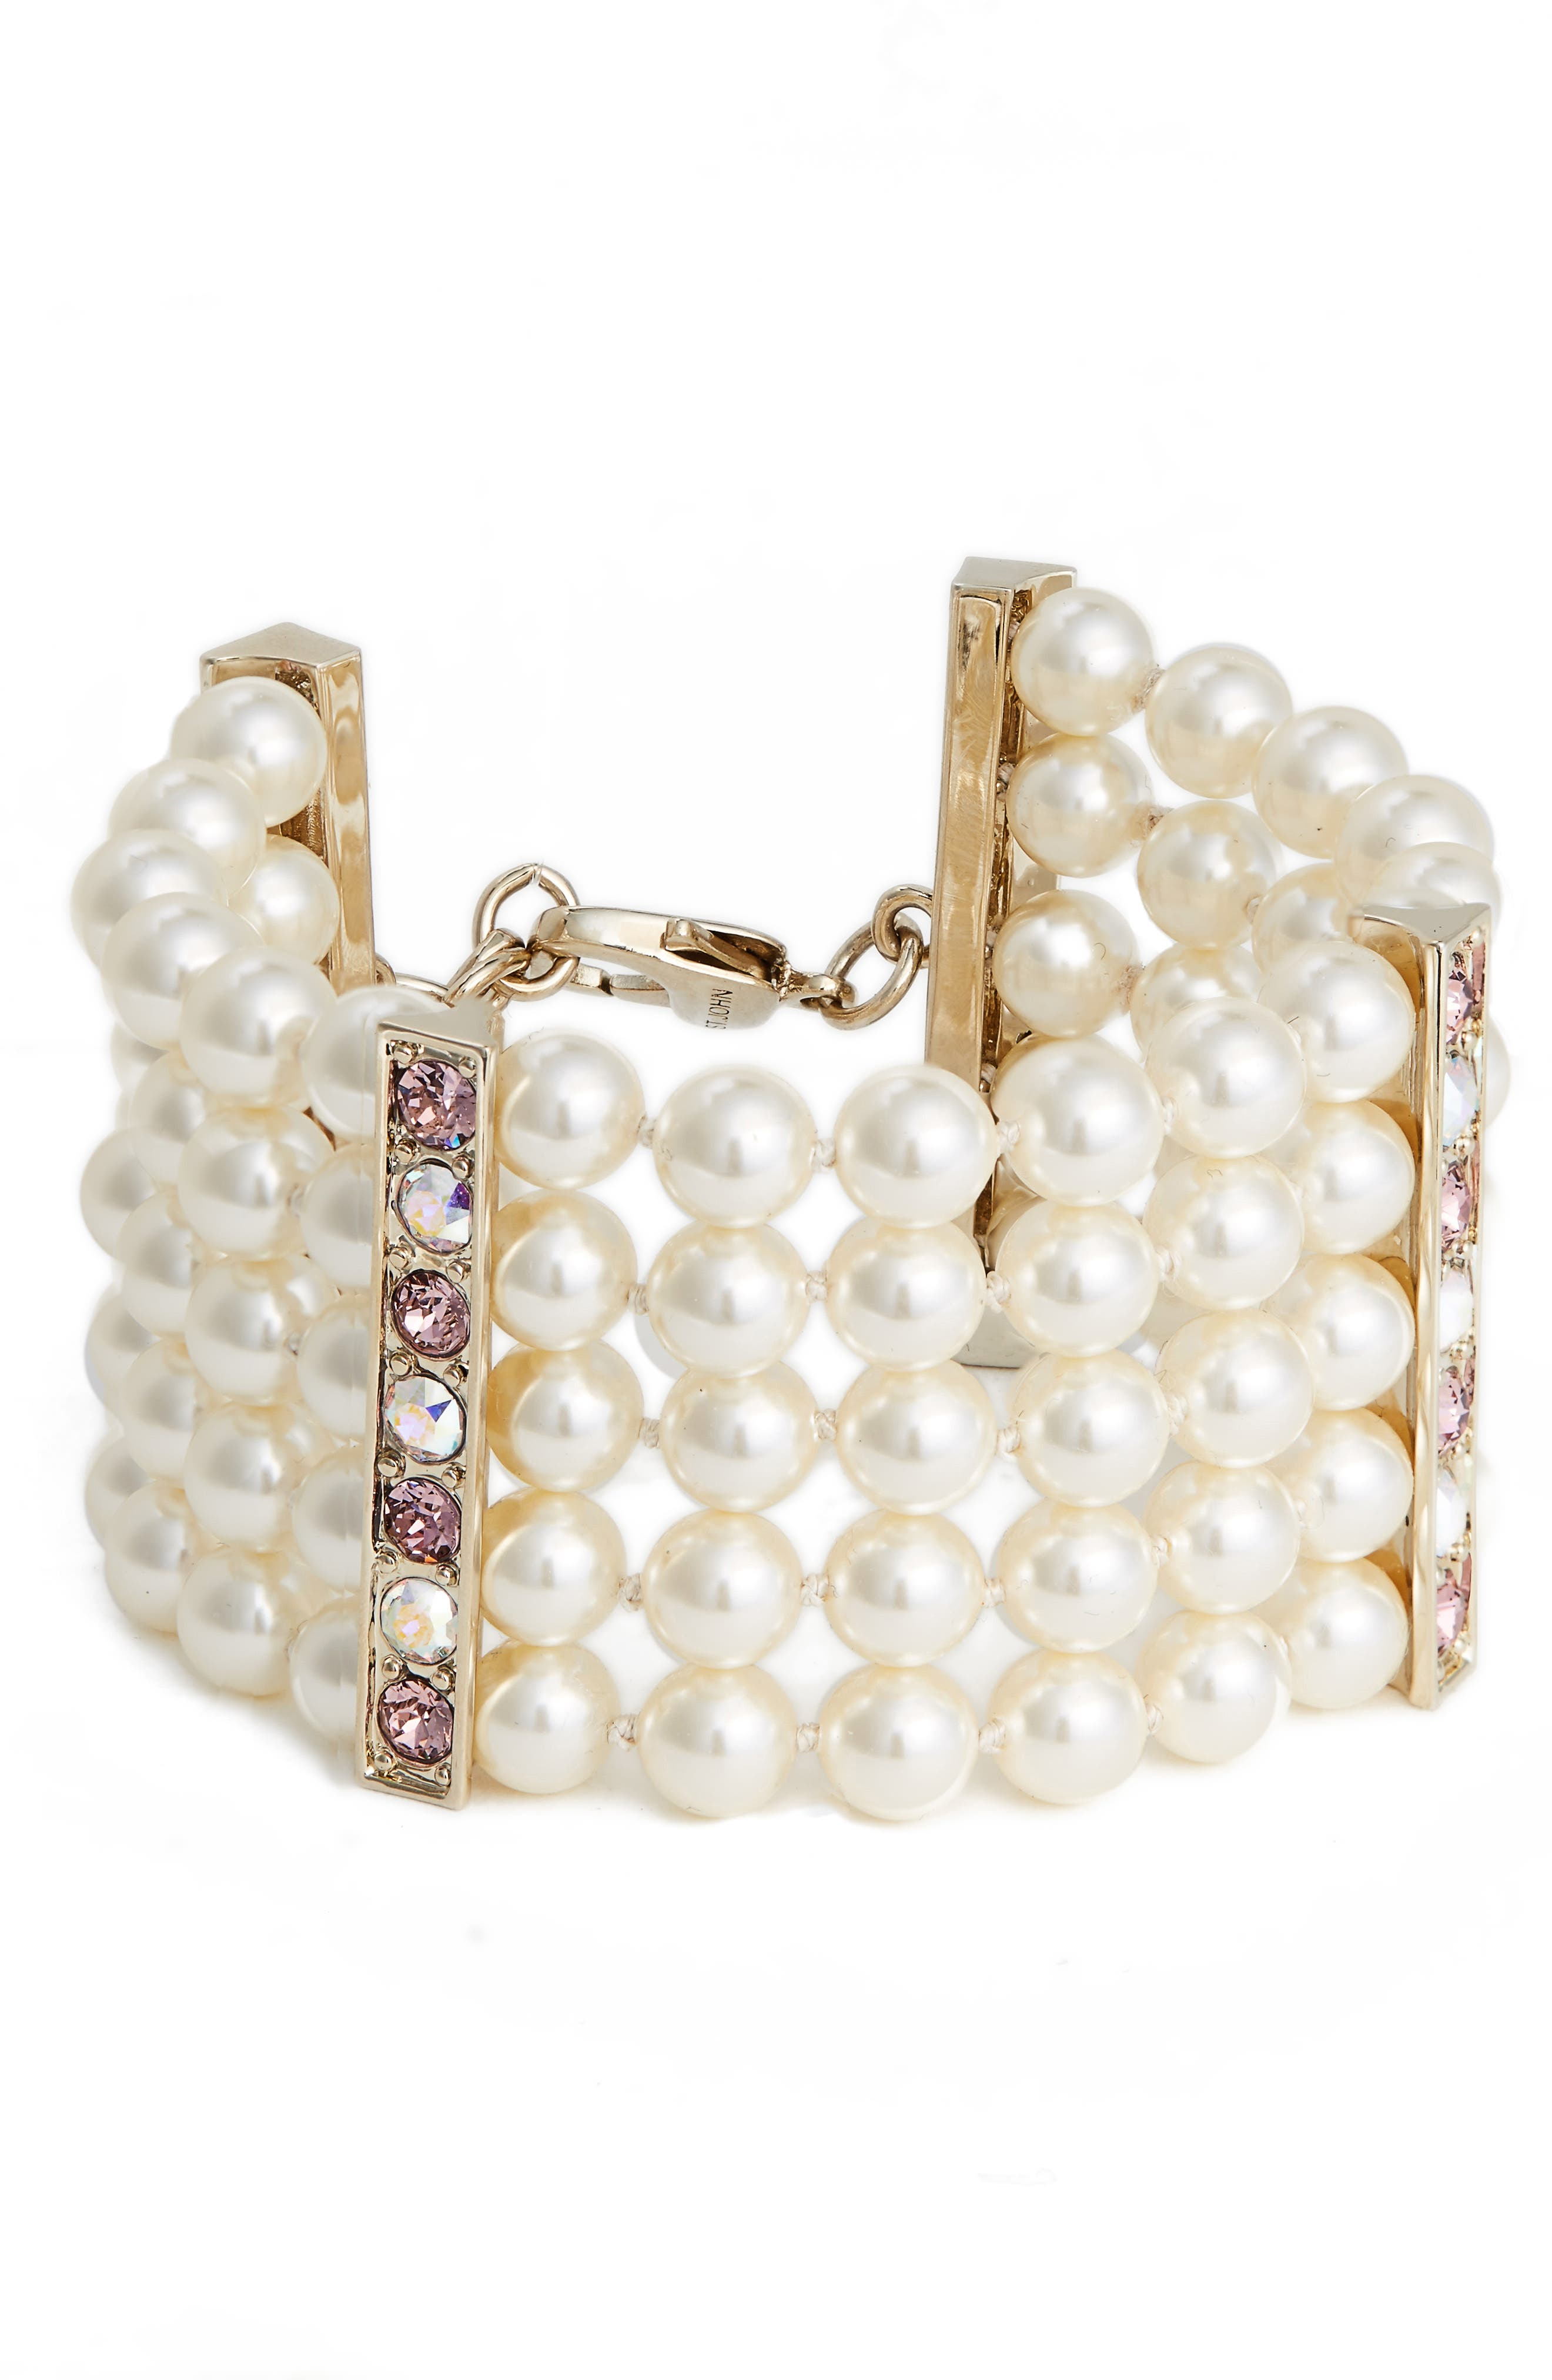 St. John Collection Swarovski Imitation Pearl & Crystal Bracelet